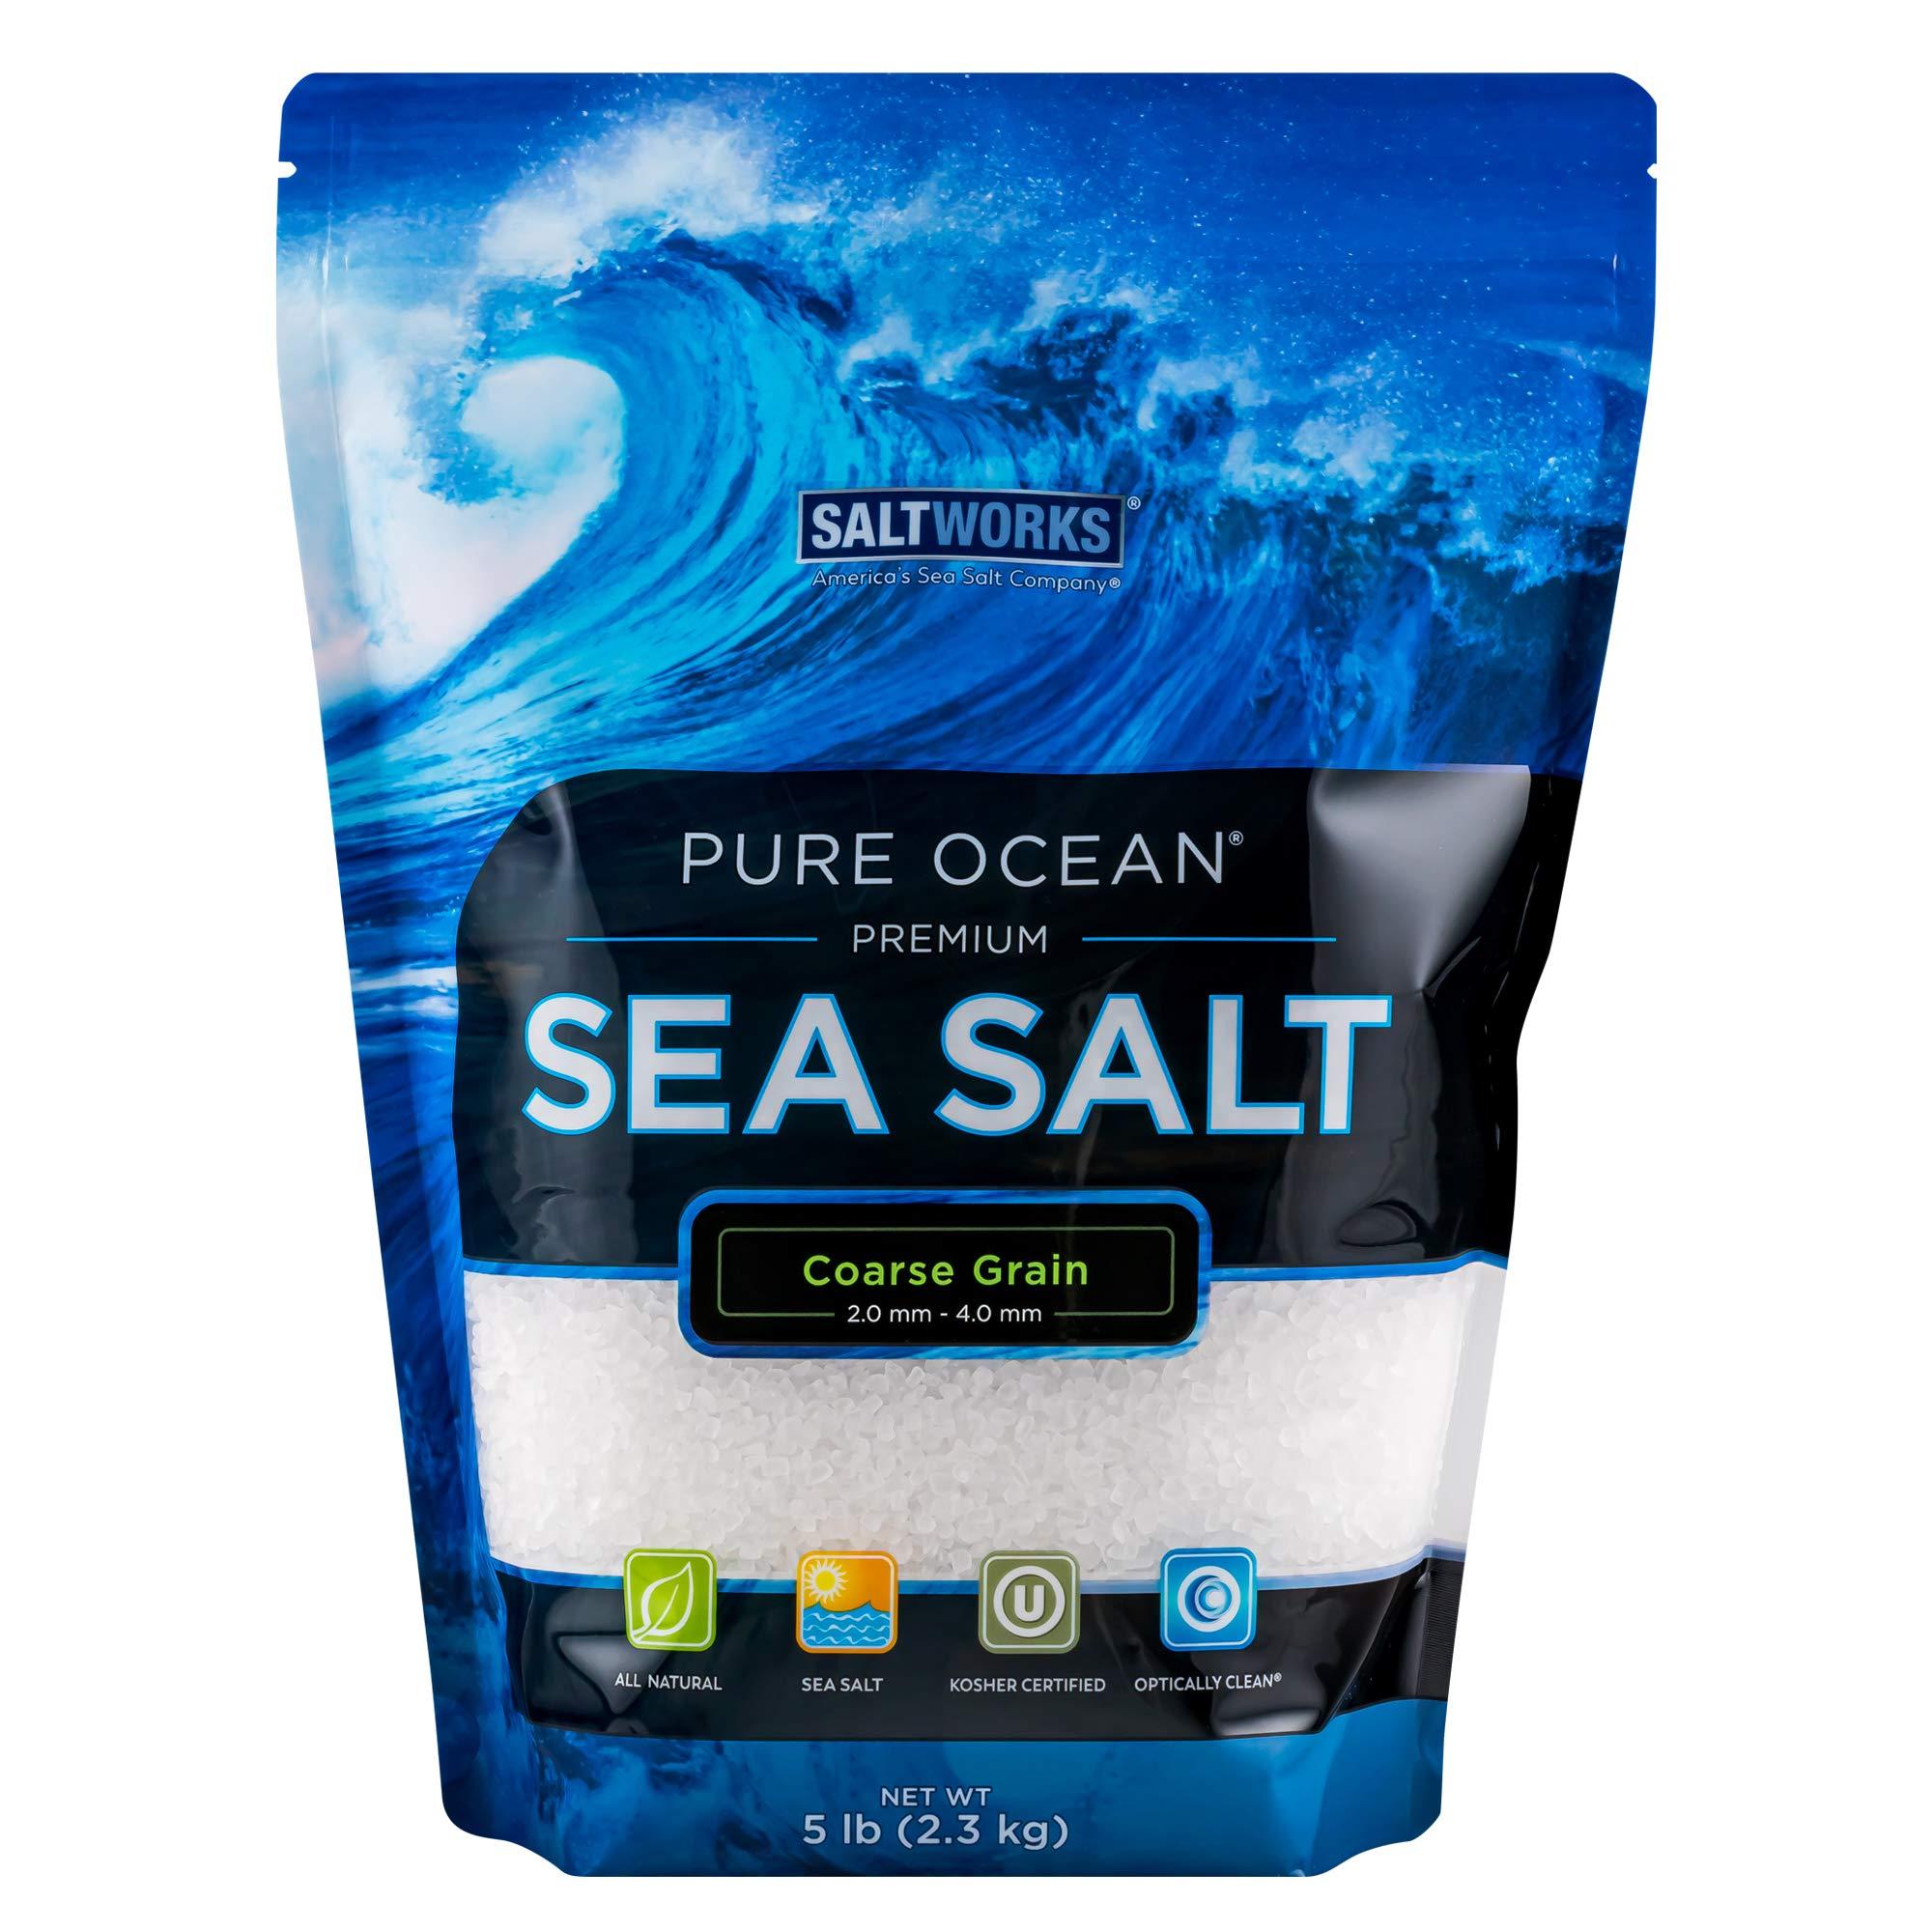 SaltWorks Pure Ocean Sea Salt, Coarse Grain, 5 Pound Bag